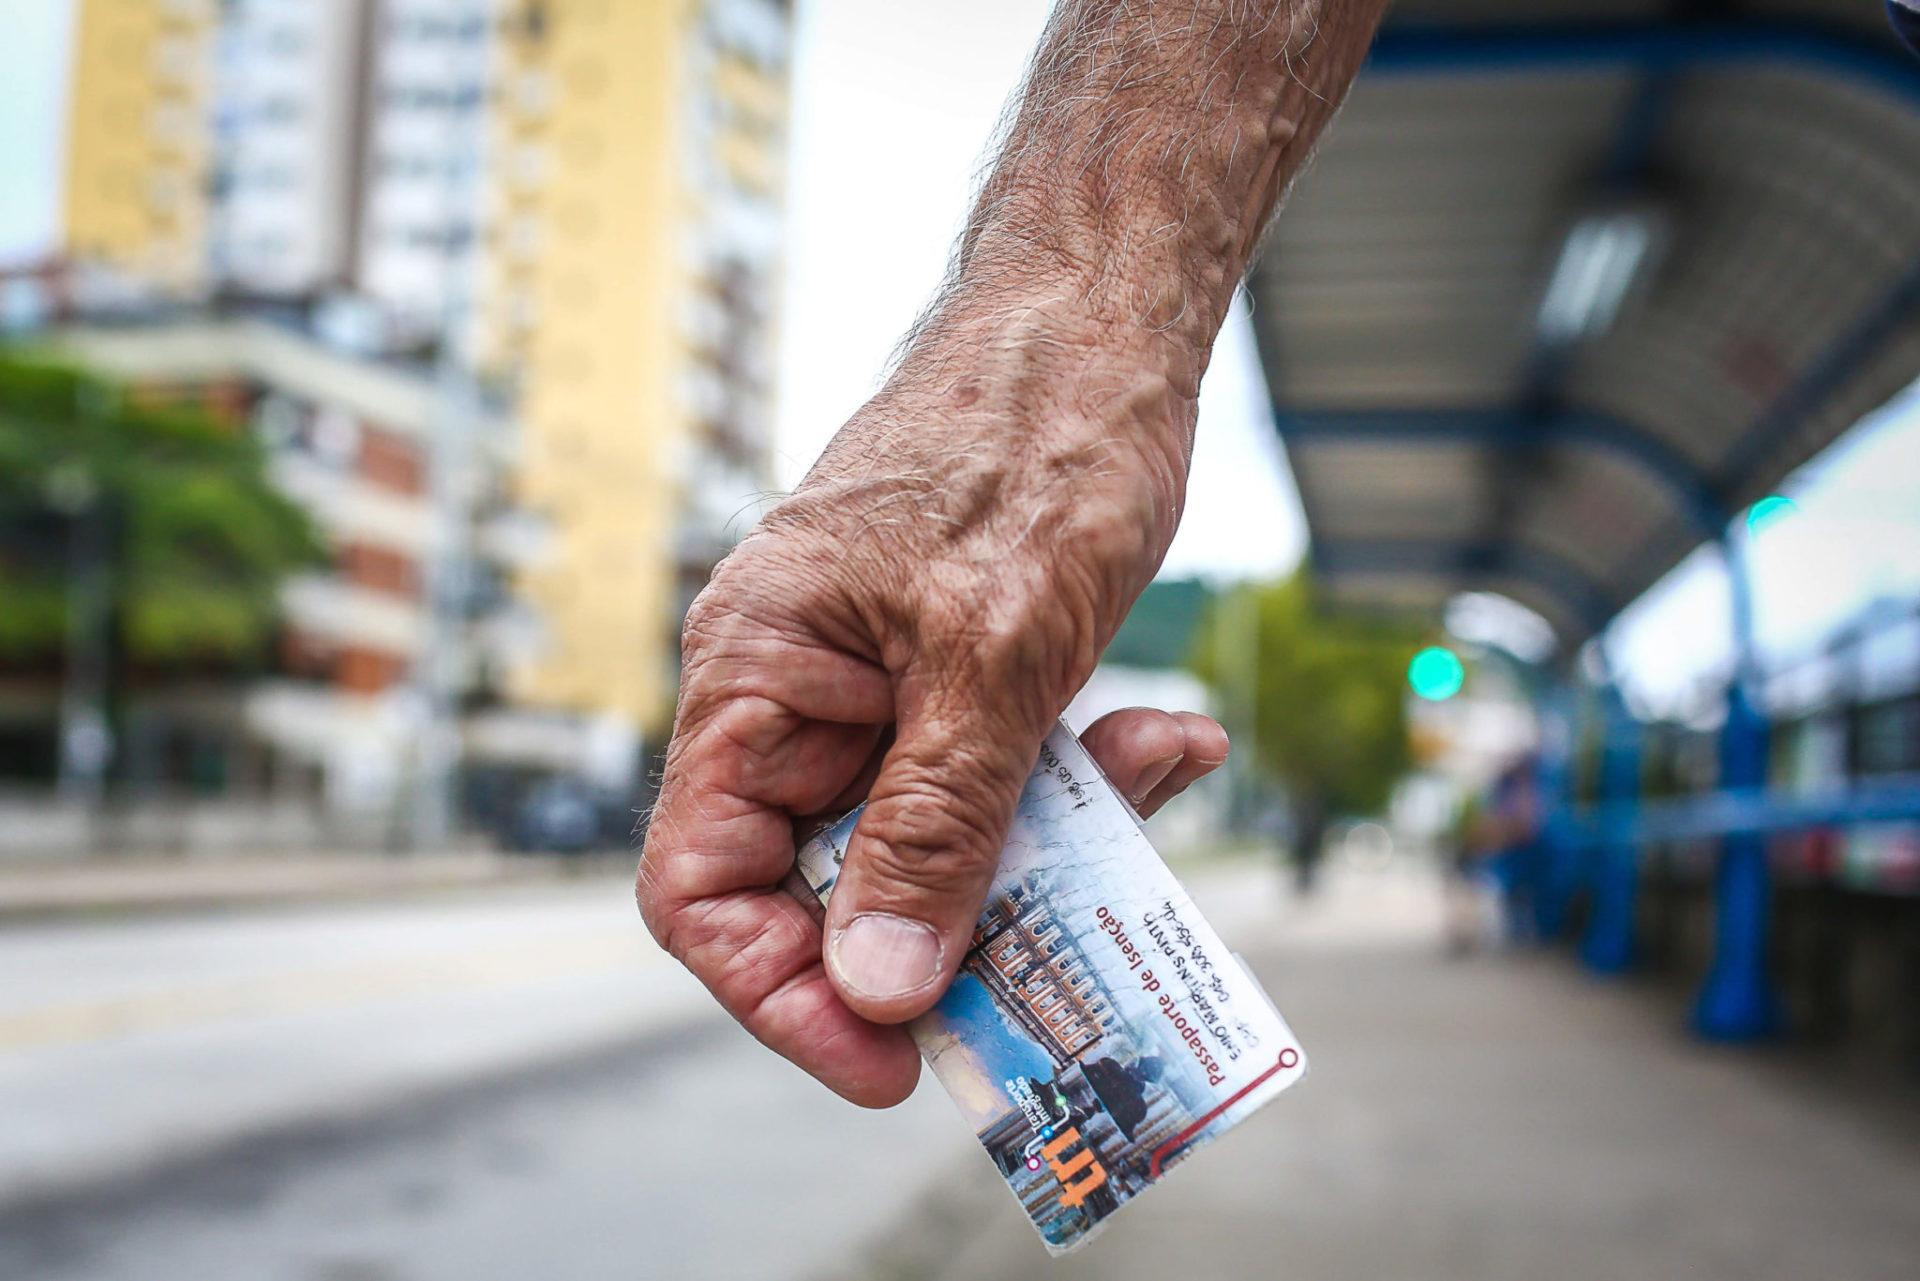 Foto: Gustavo Roth/Arquivo EPTC PMPA